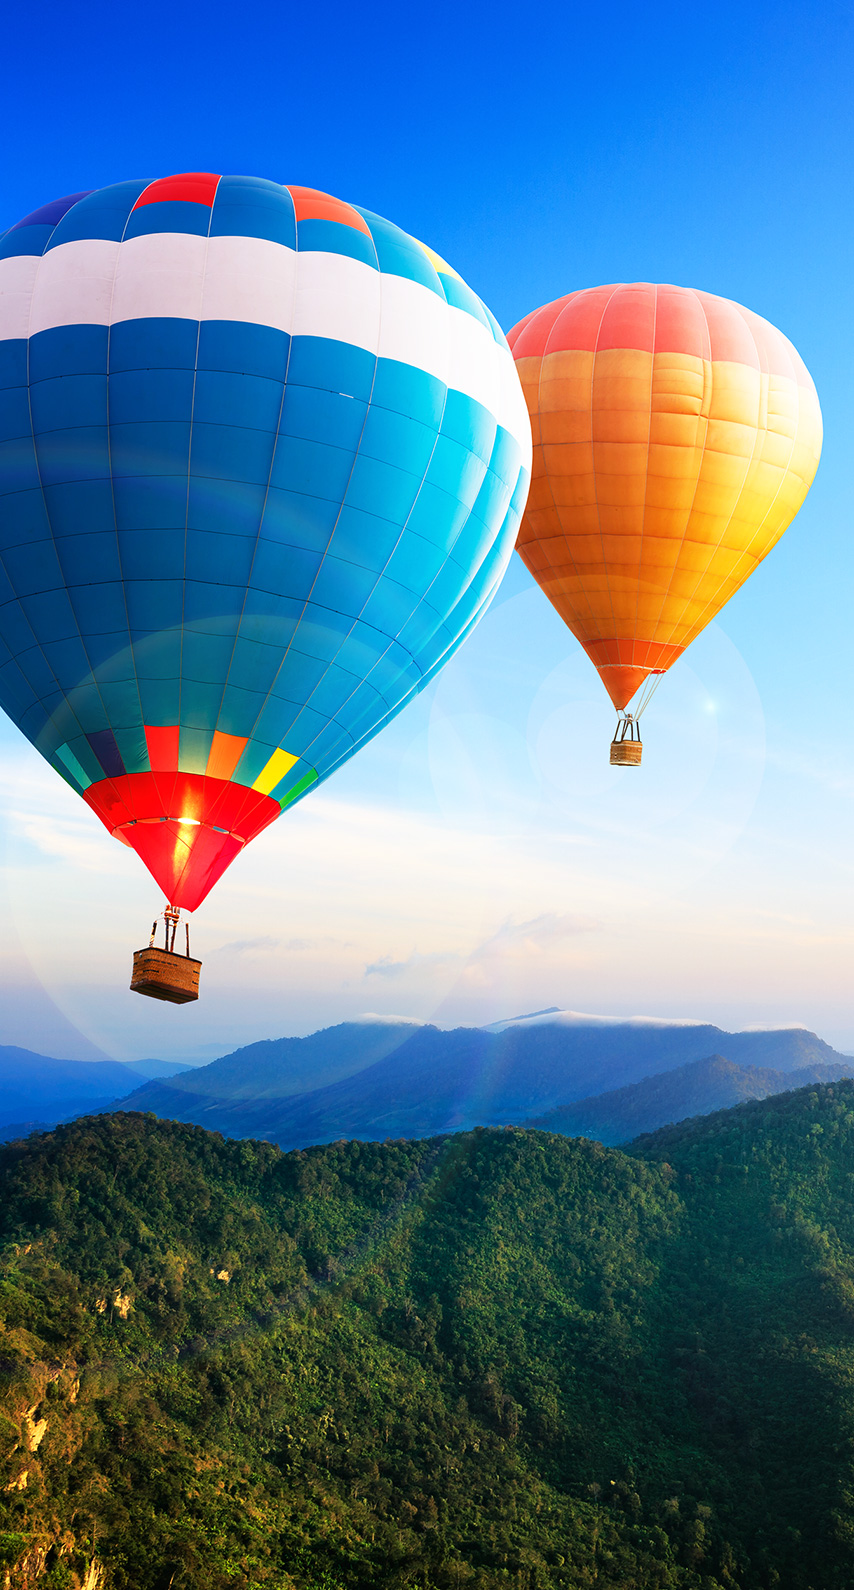 daytime, hot air balloon